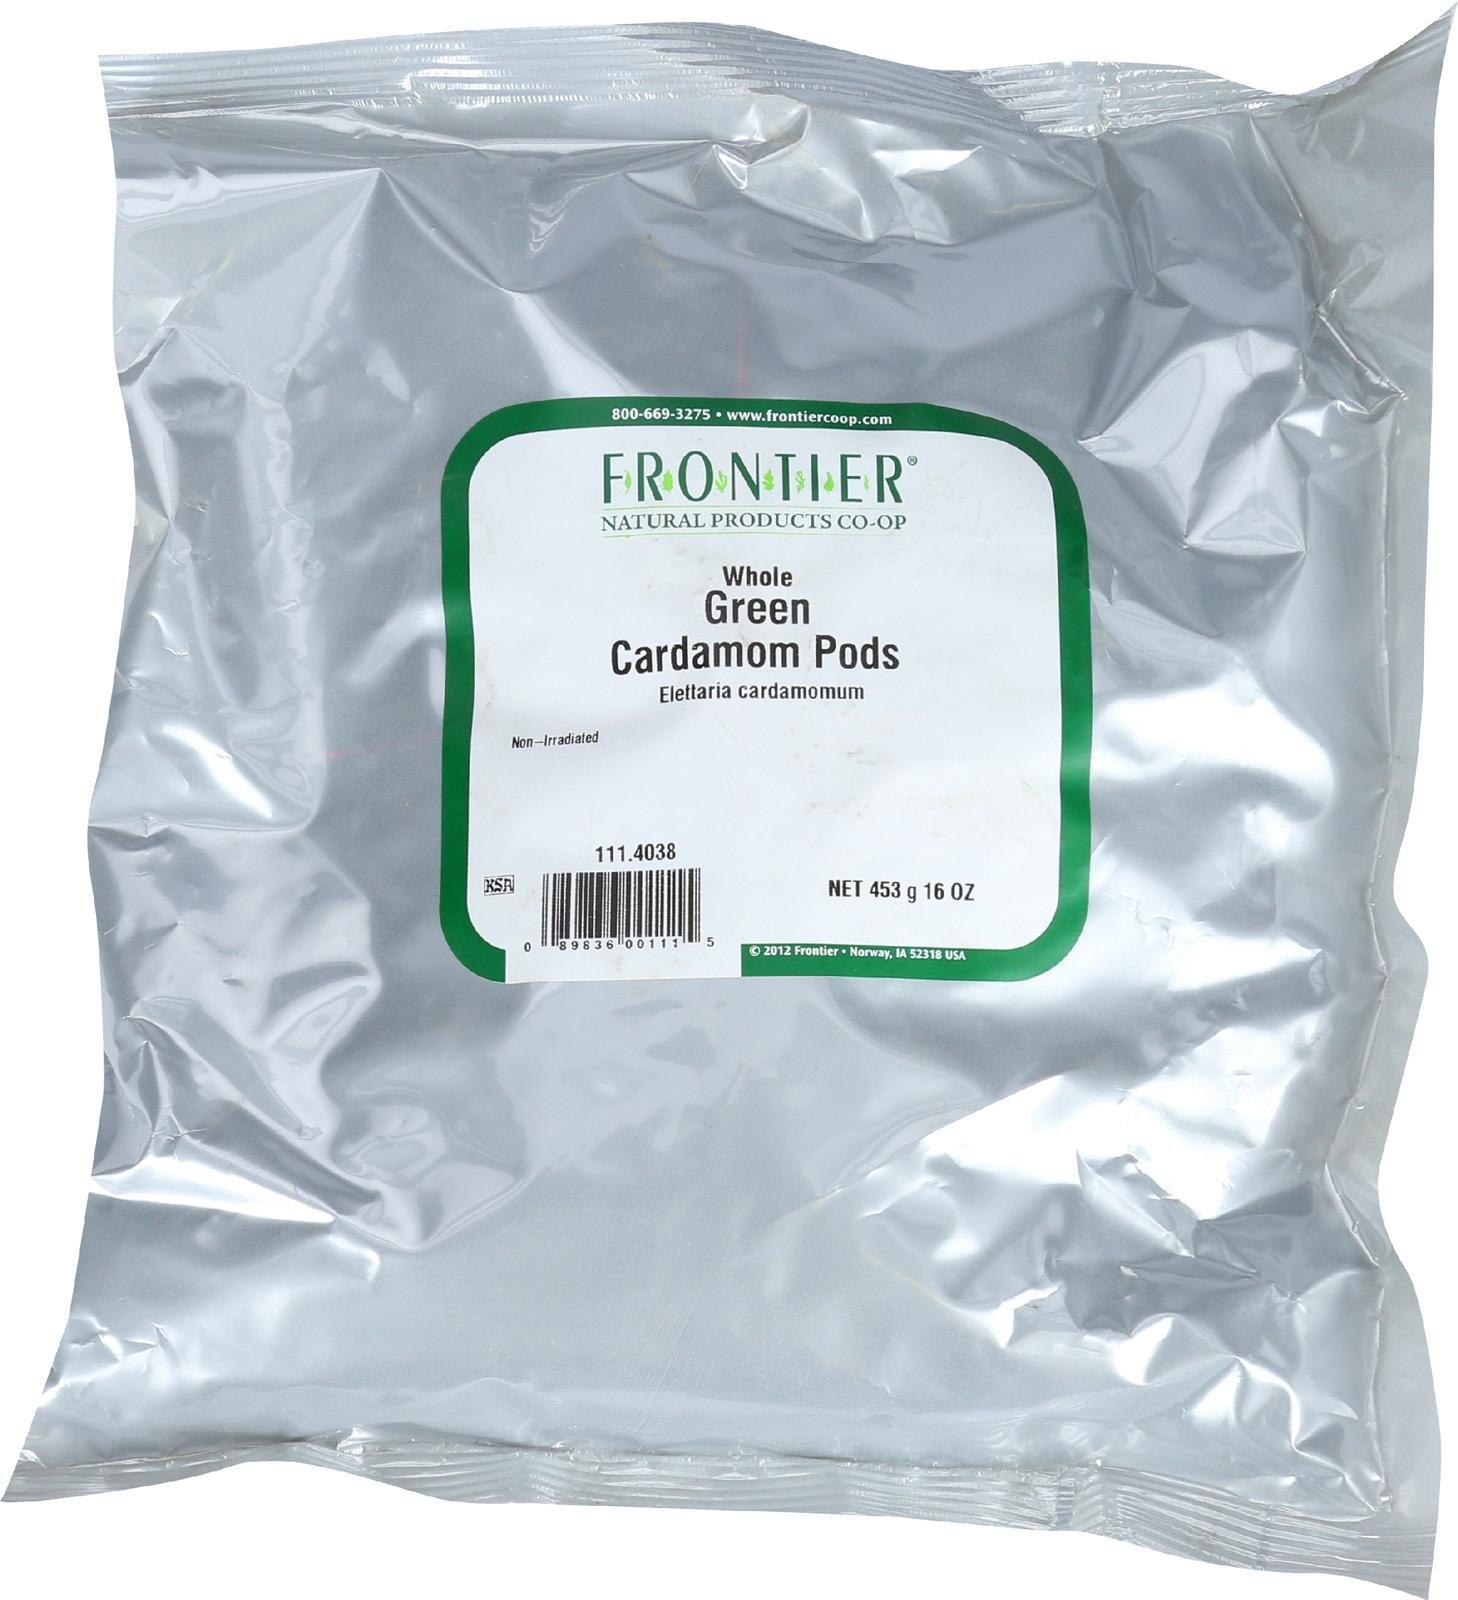 Frontier Cardamom Pods Whl/Green (1x1LB )